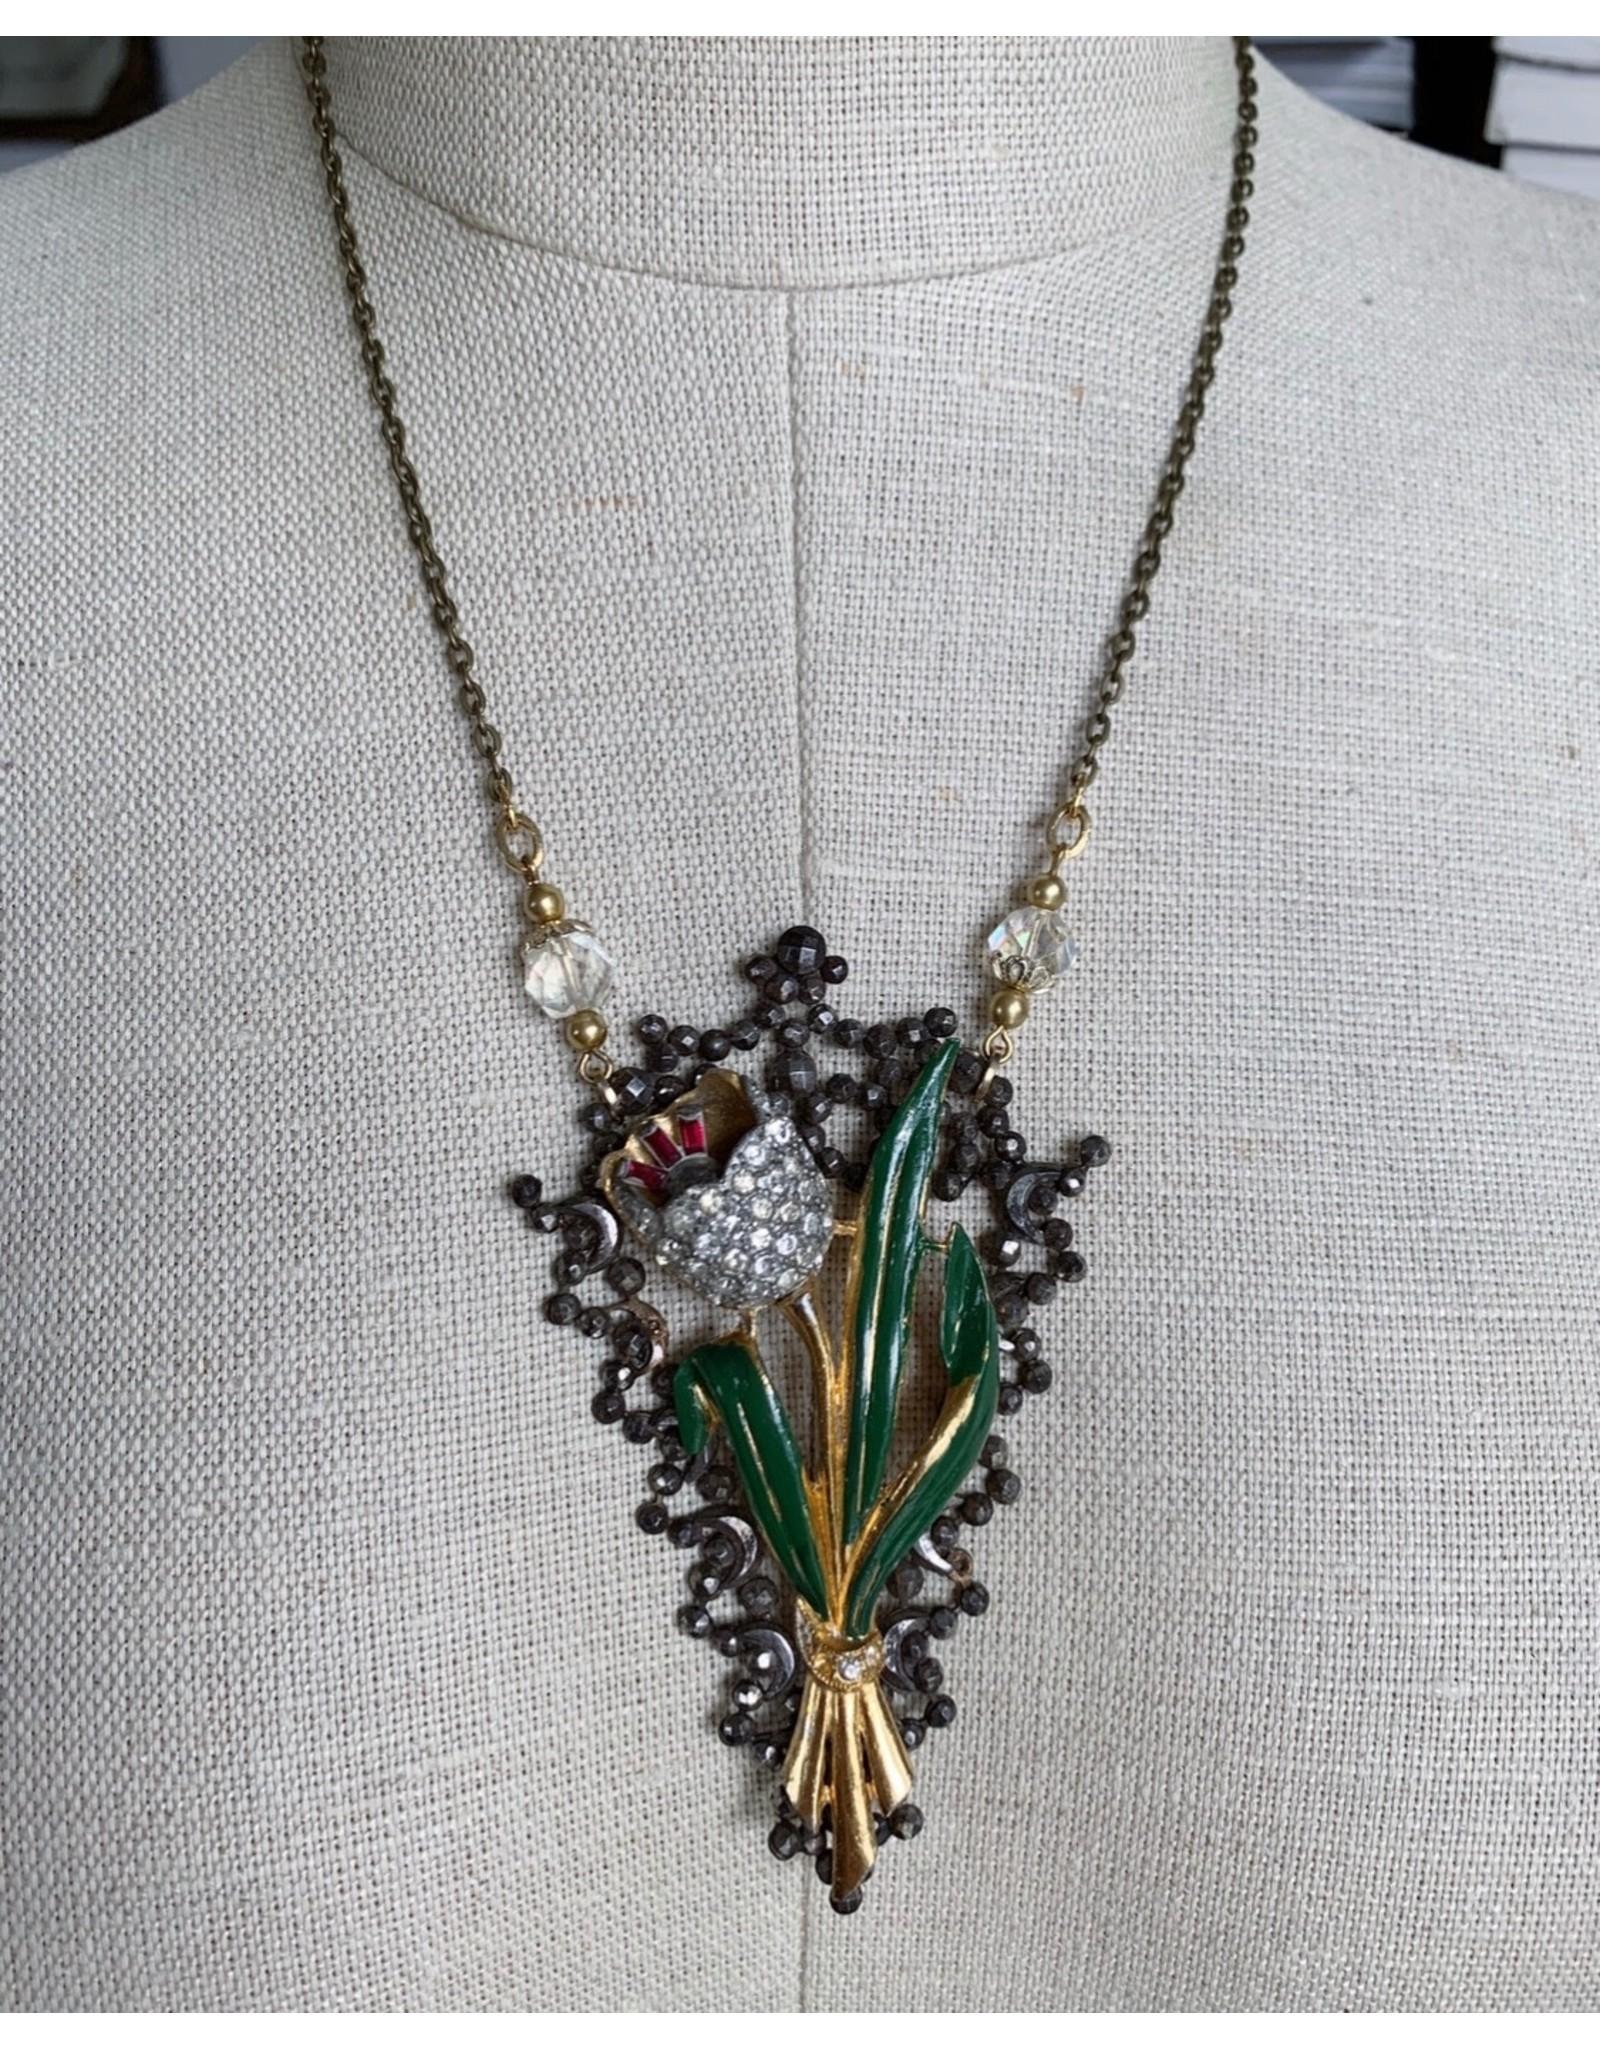 Vintage Floral Brooch and Buckle Necklace